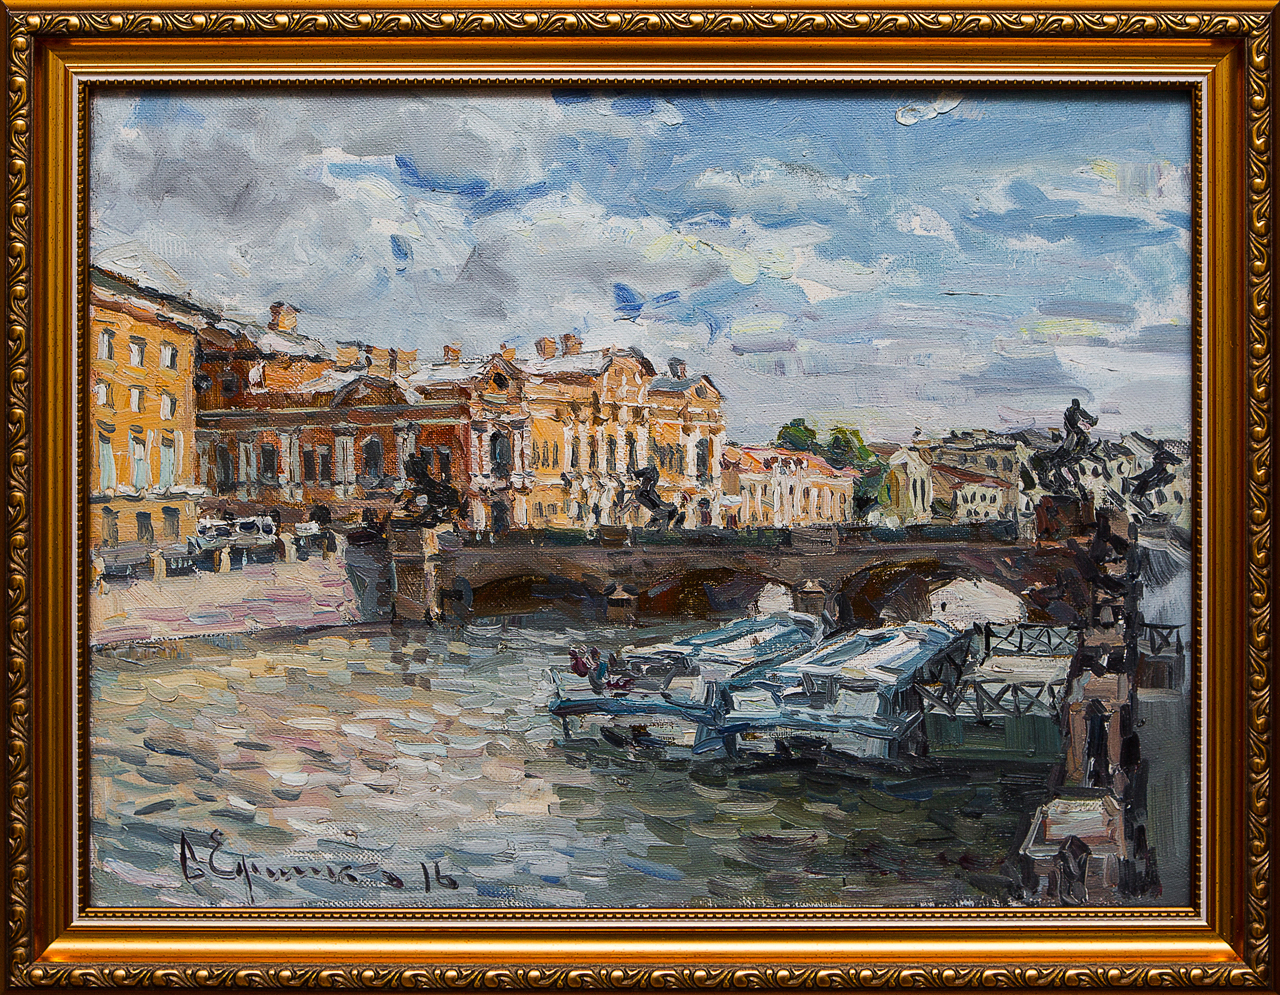 Картина маслом Вид на Аничков мост Ефименко картина маслом вид на петропавловскую крепость ефименко